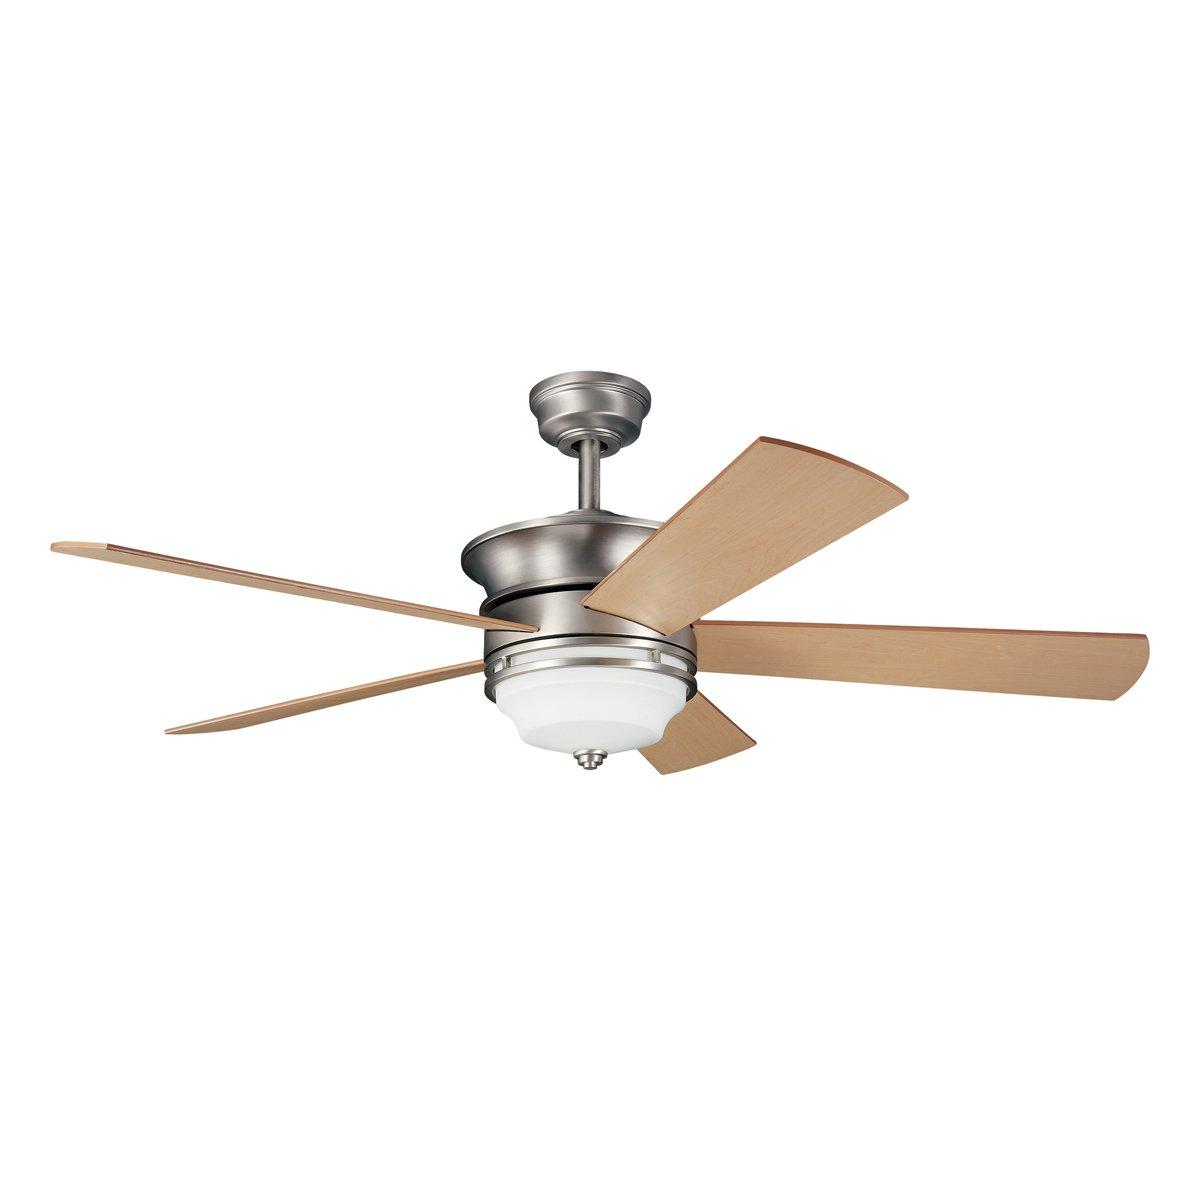 Kichler NI 52 Ceiling Fan Amazon